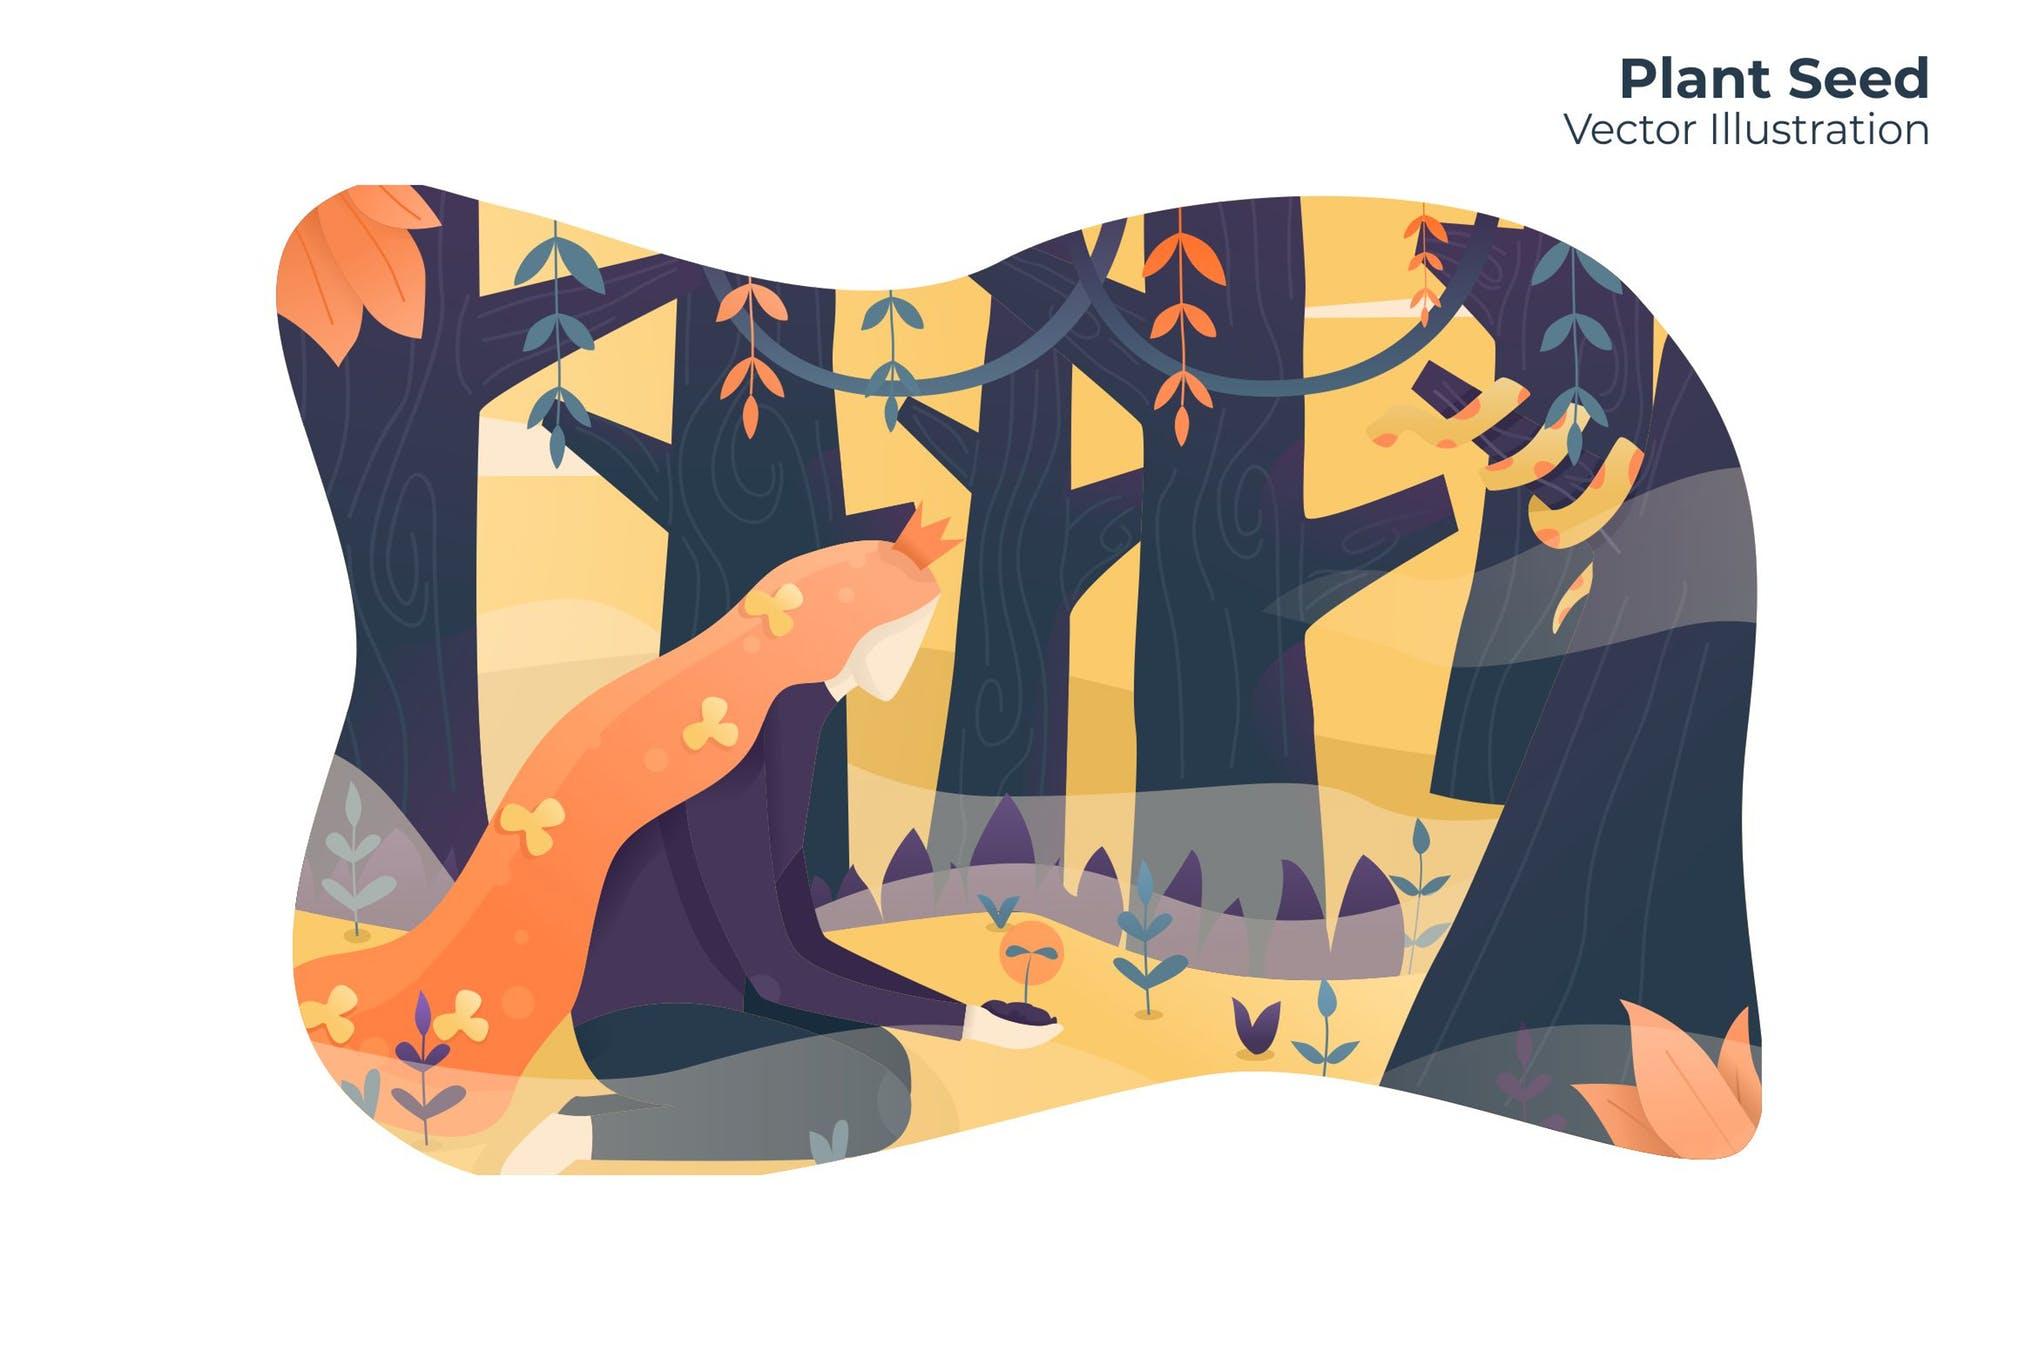 植物种子种植创意插画场景素材下载Plant Seed - Vector Illustration